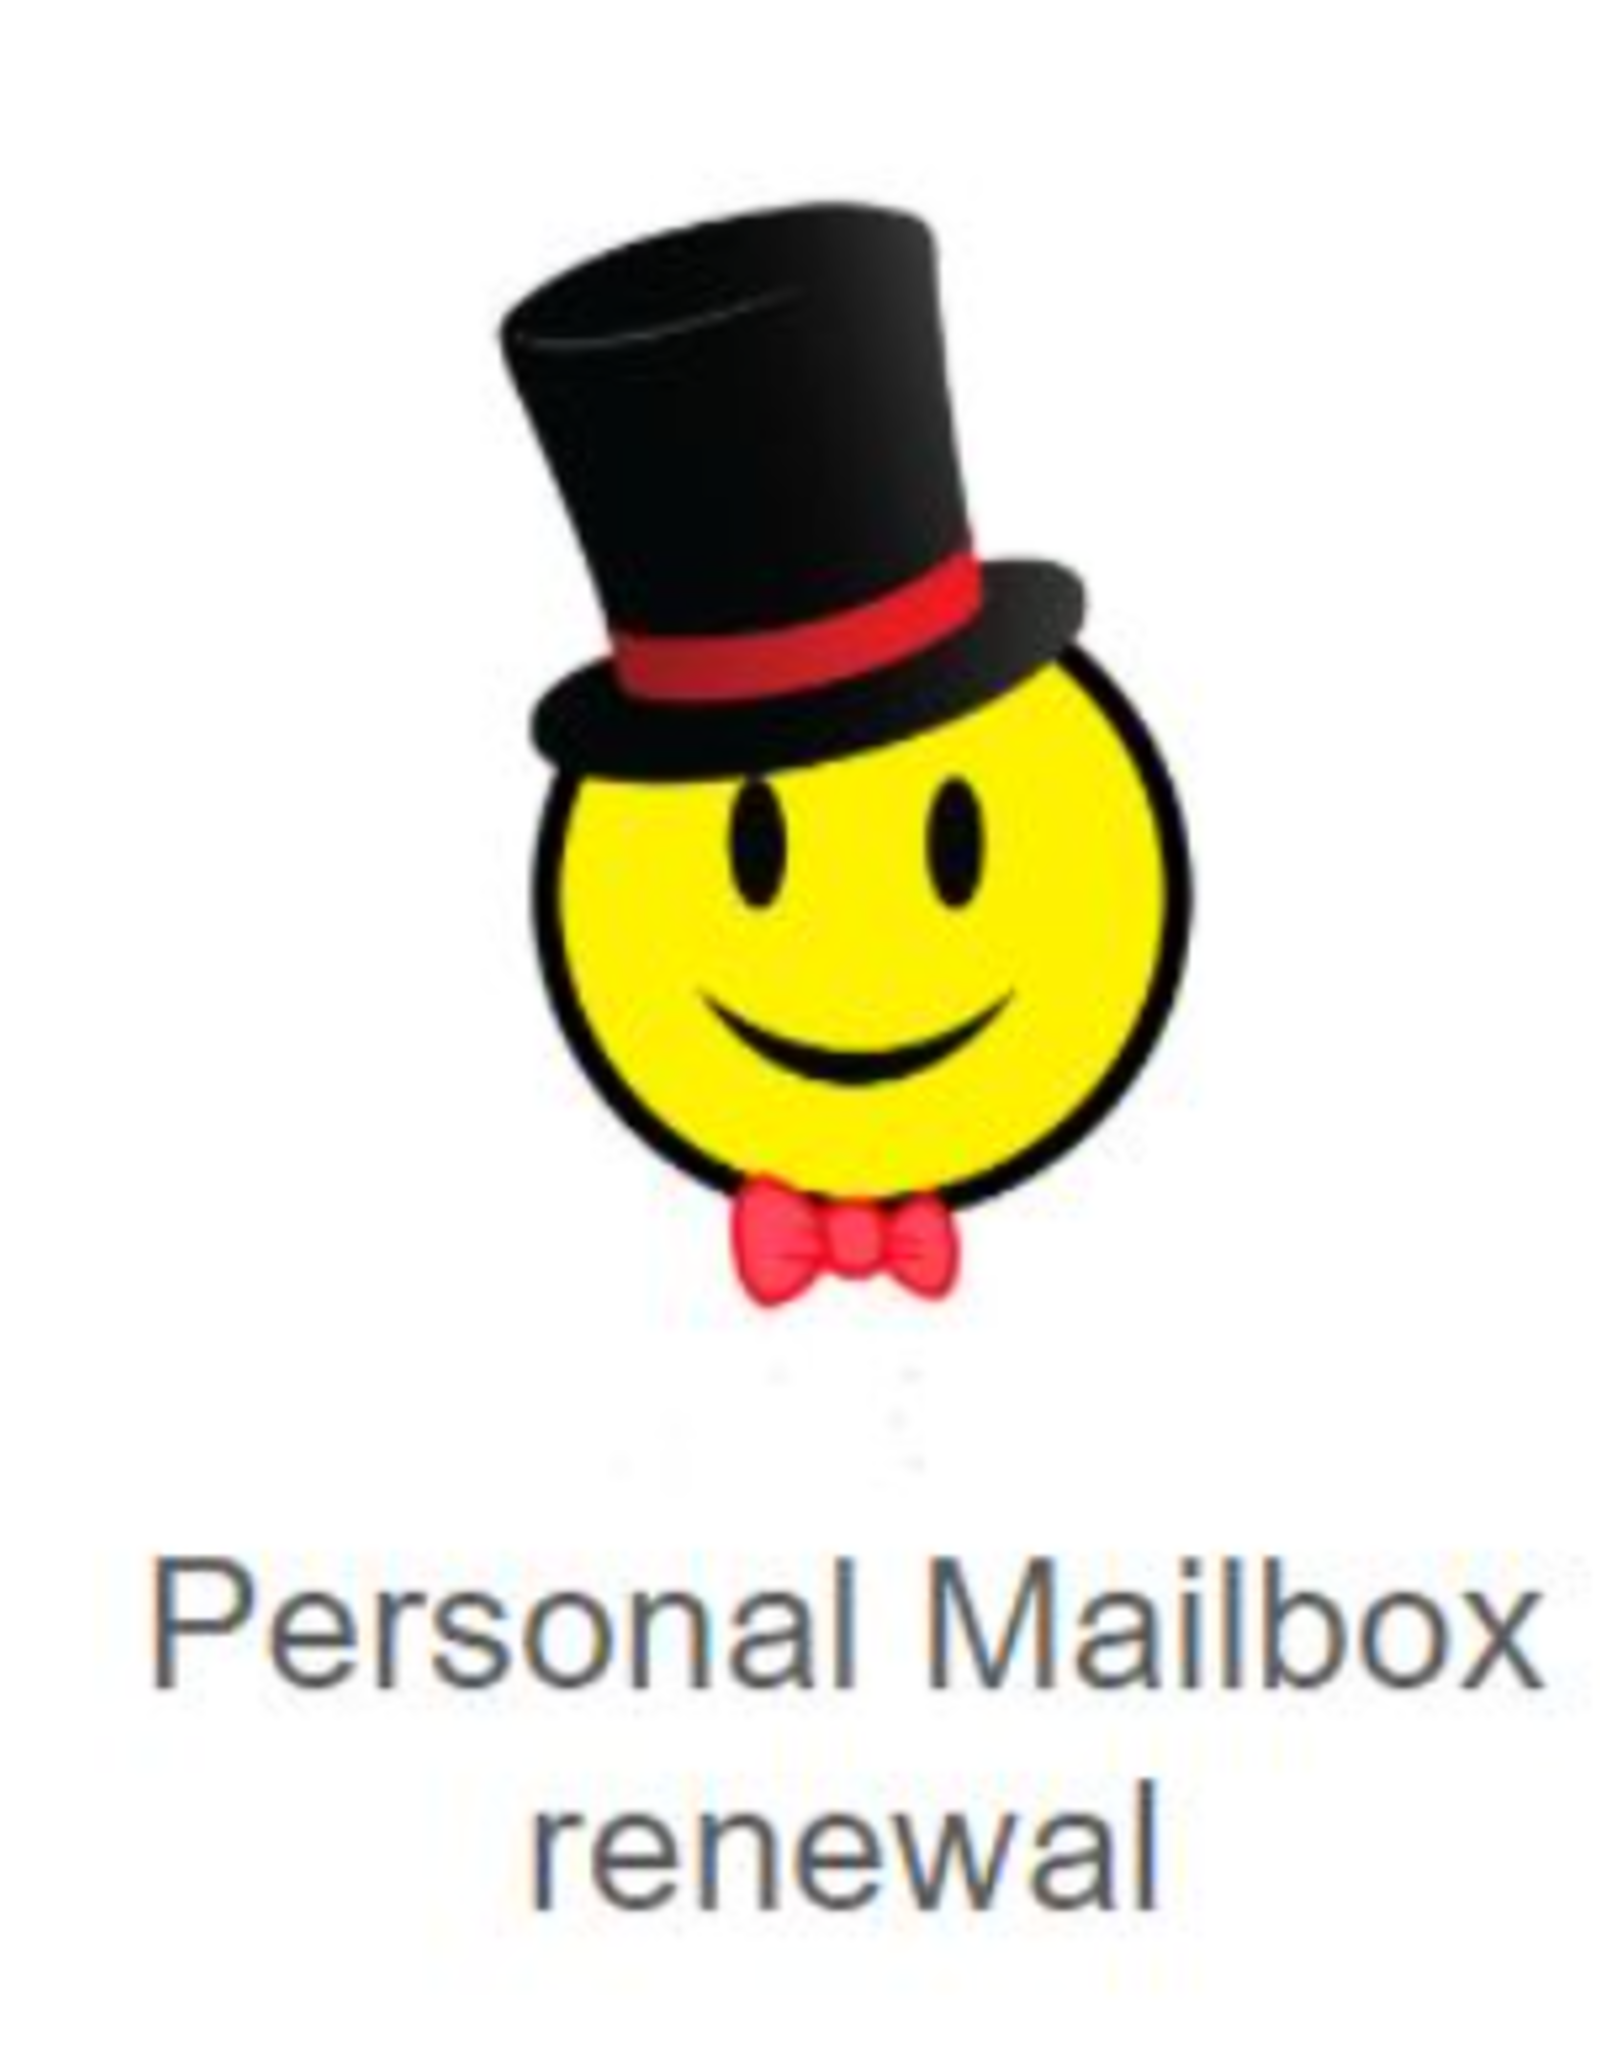 Postal Services - Mailbox 6 Months